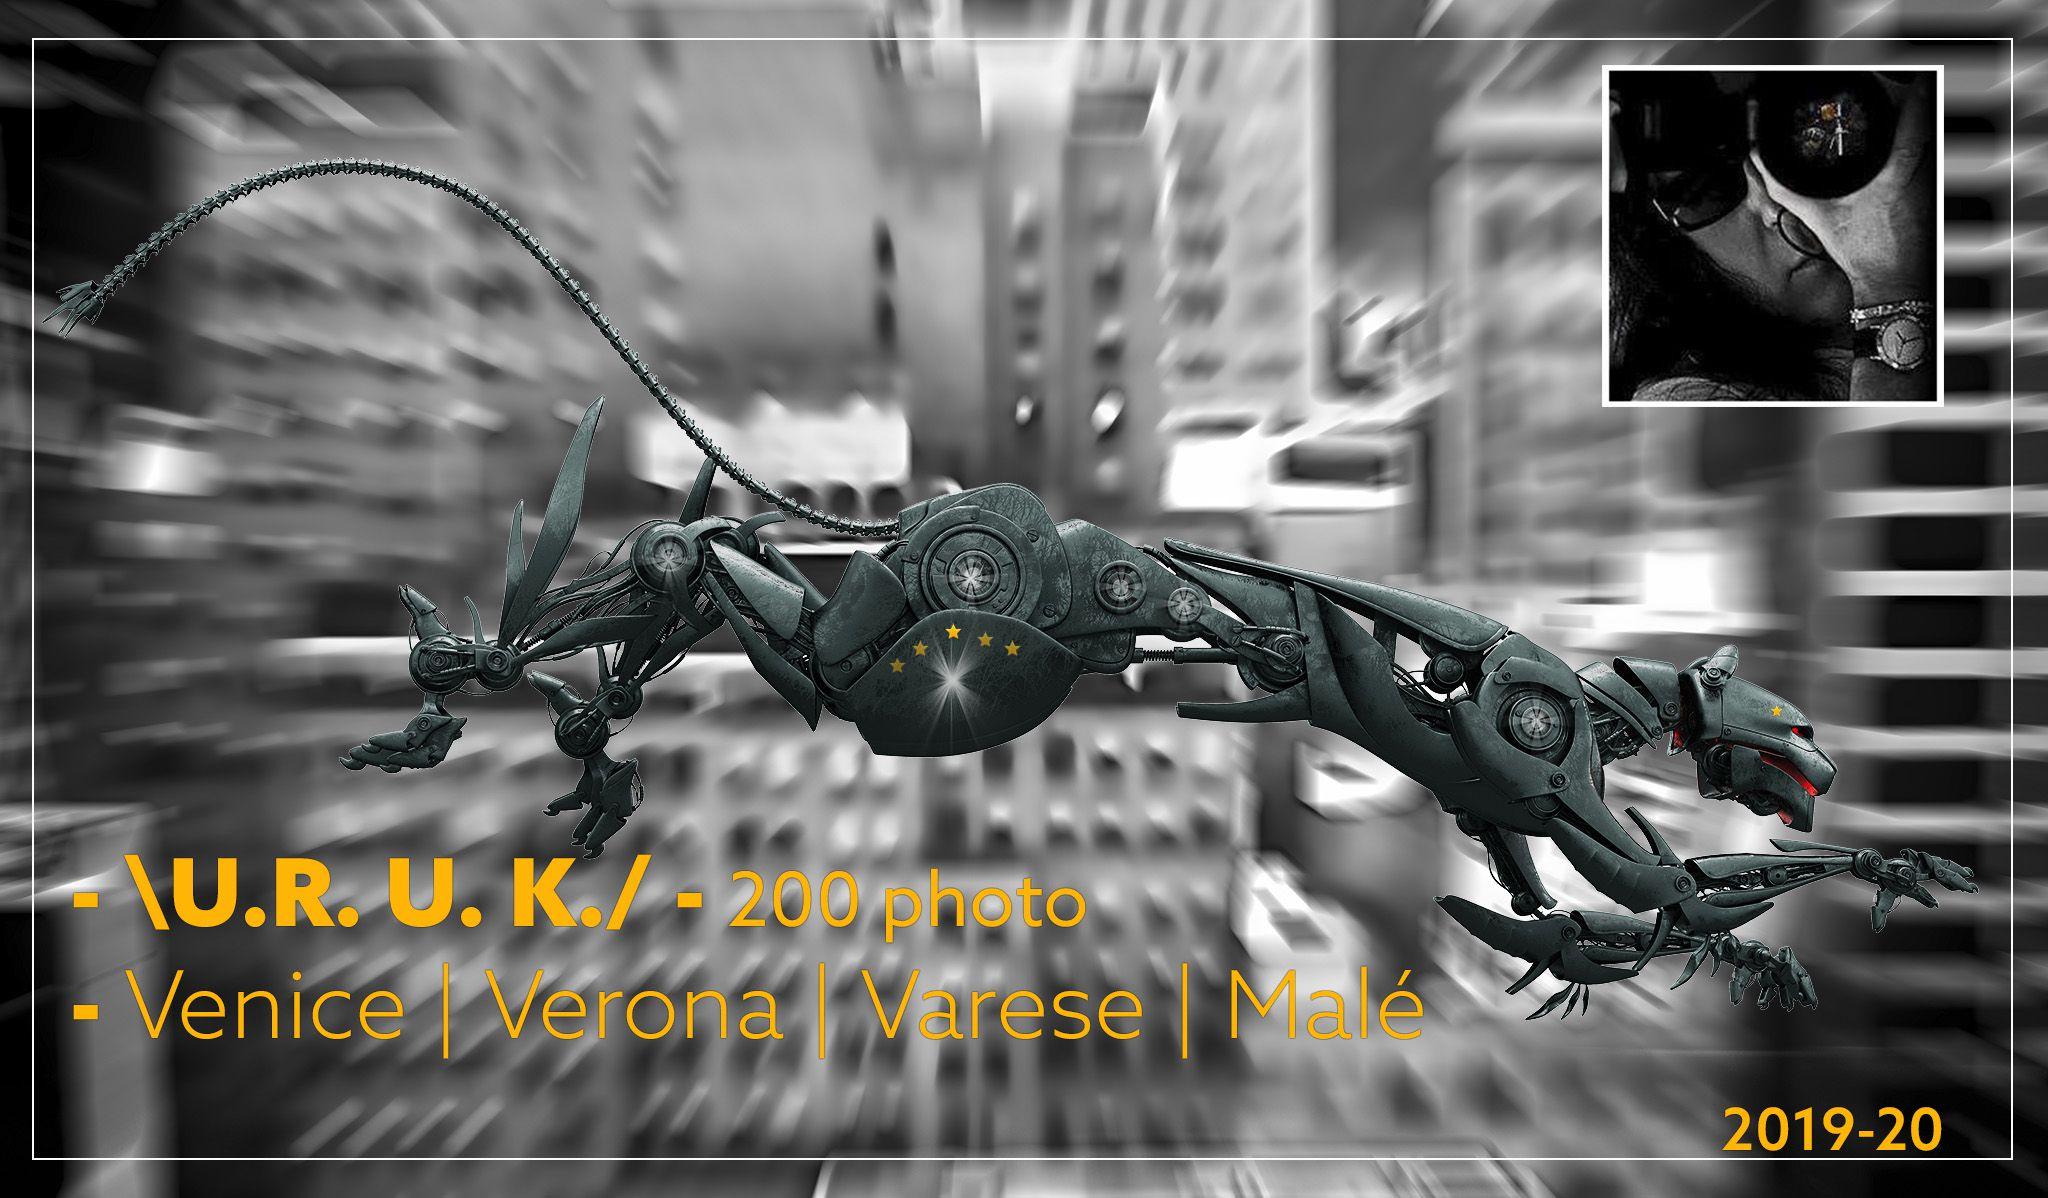 <img src=https://www.urukweb.com/2020/hakarproject/expo/p/urukgiaguerov.jpg><br><br>x